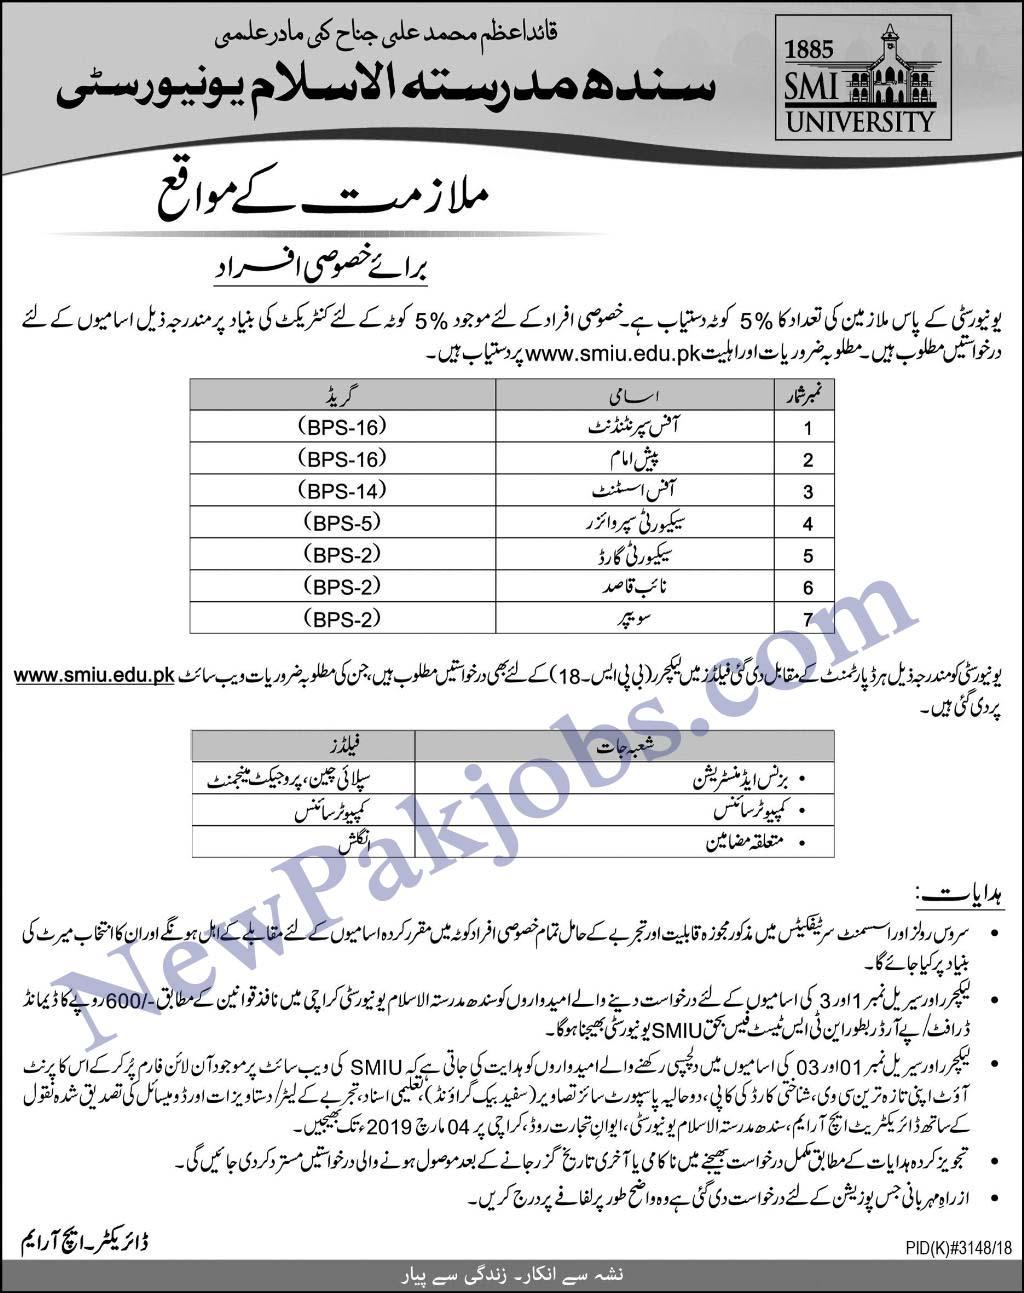 Sindh Madressatul Islam University Jobs 2019